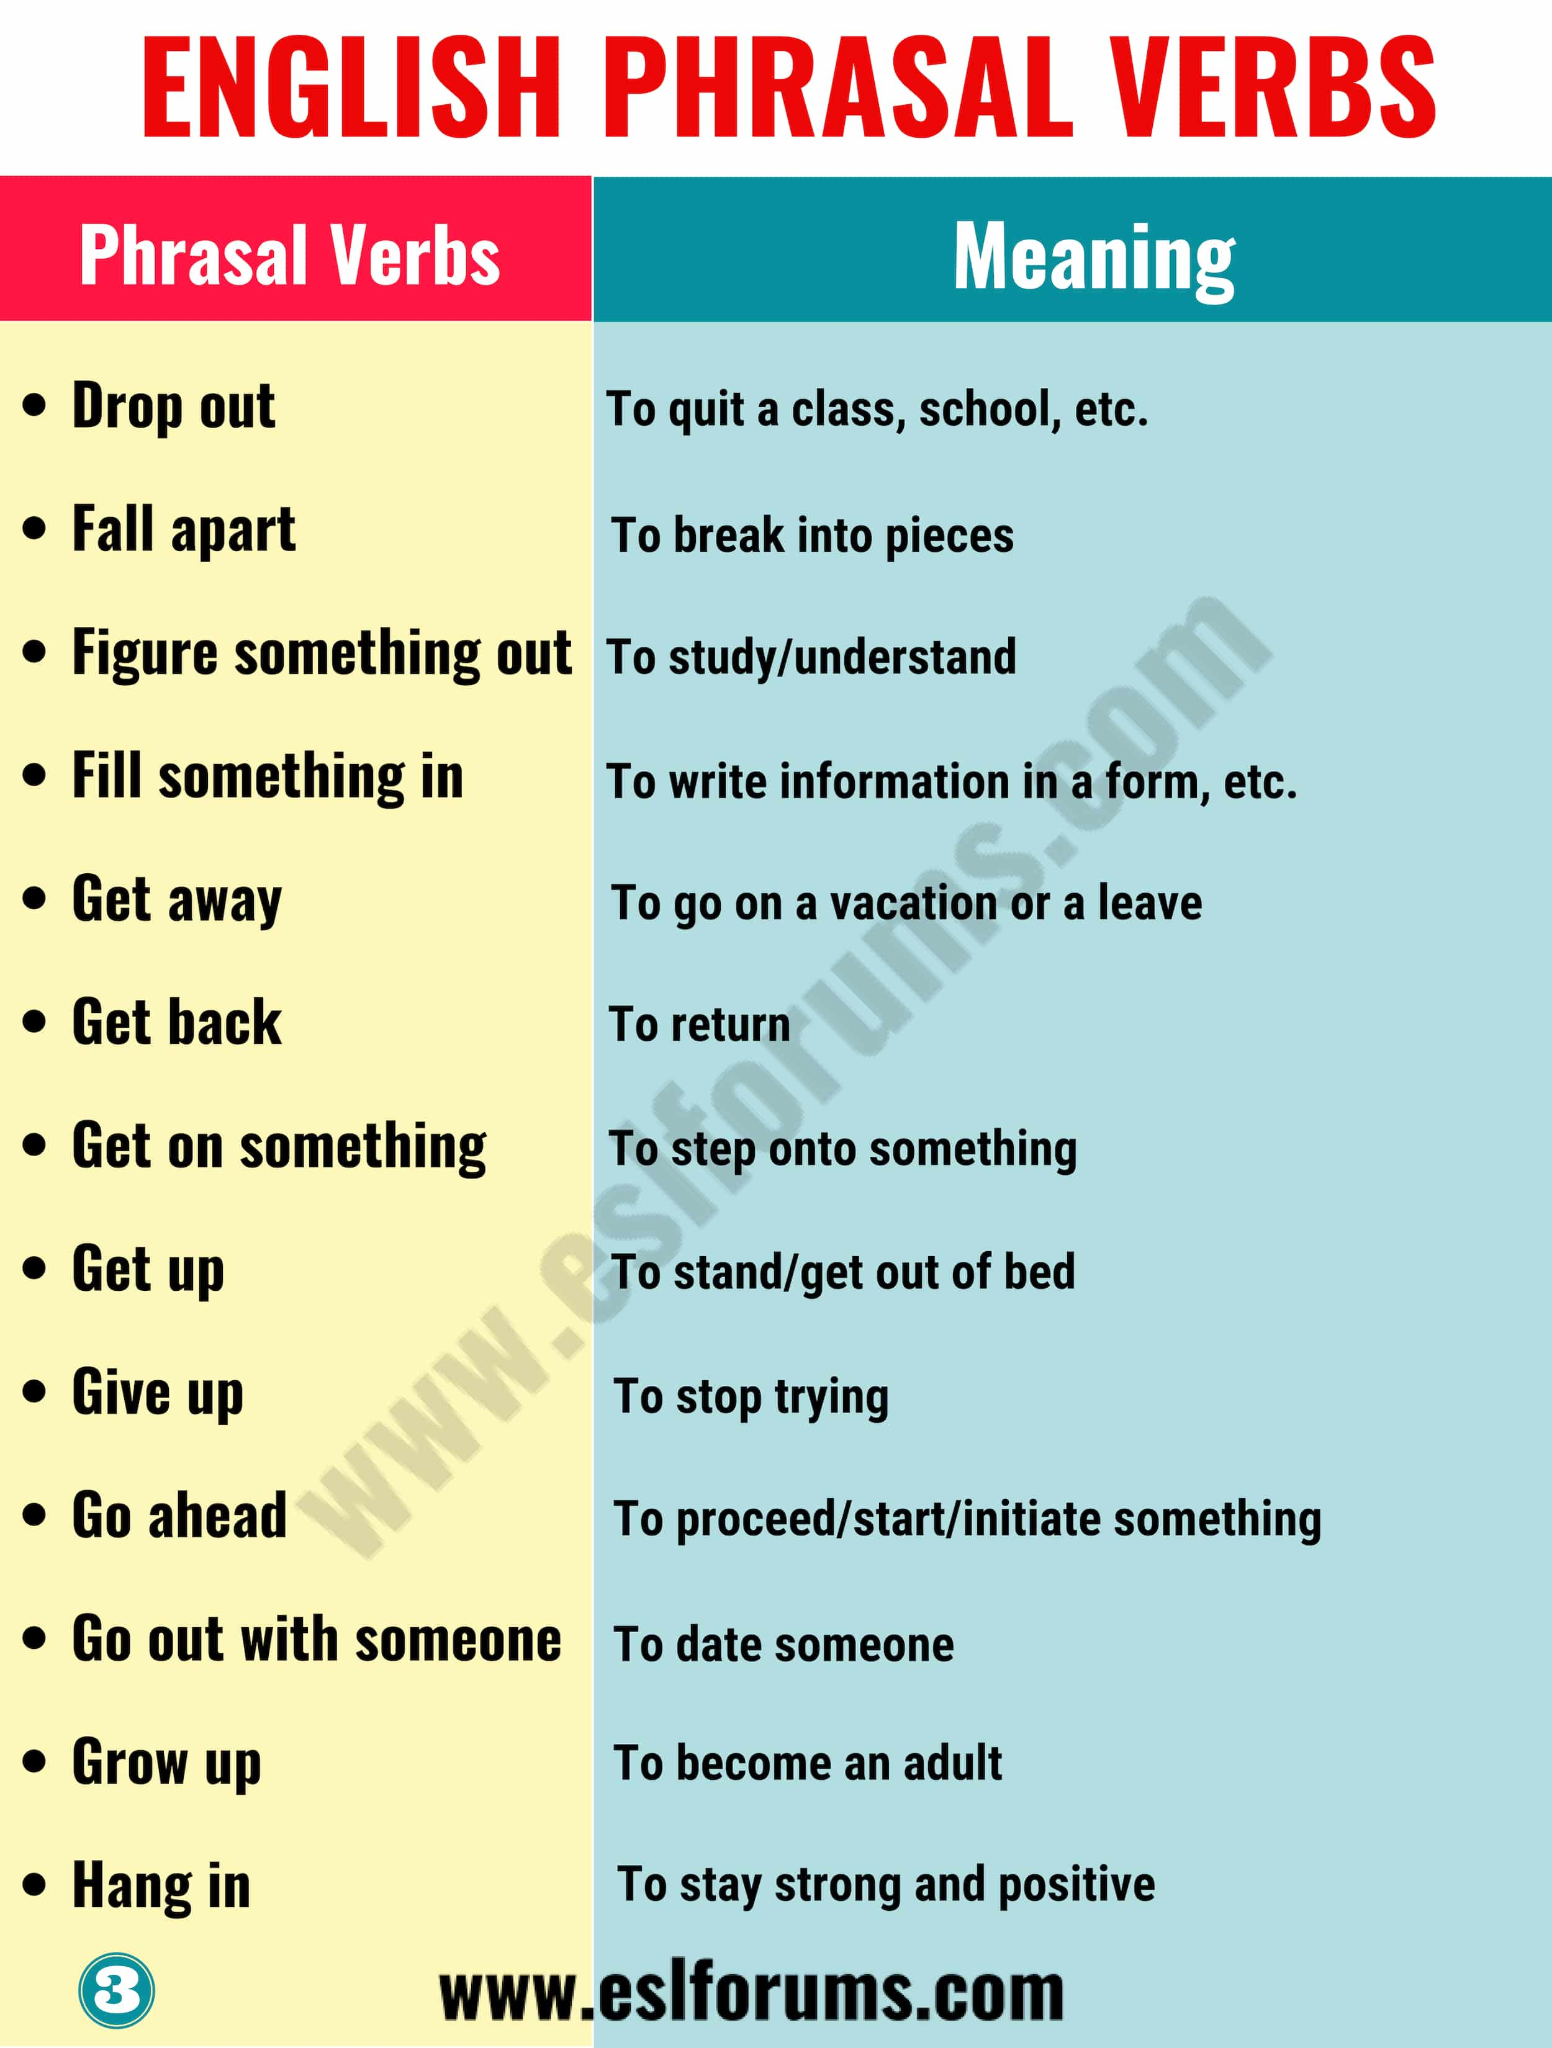 To break the news phrasal verb